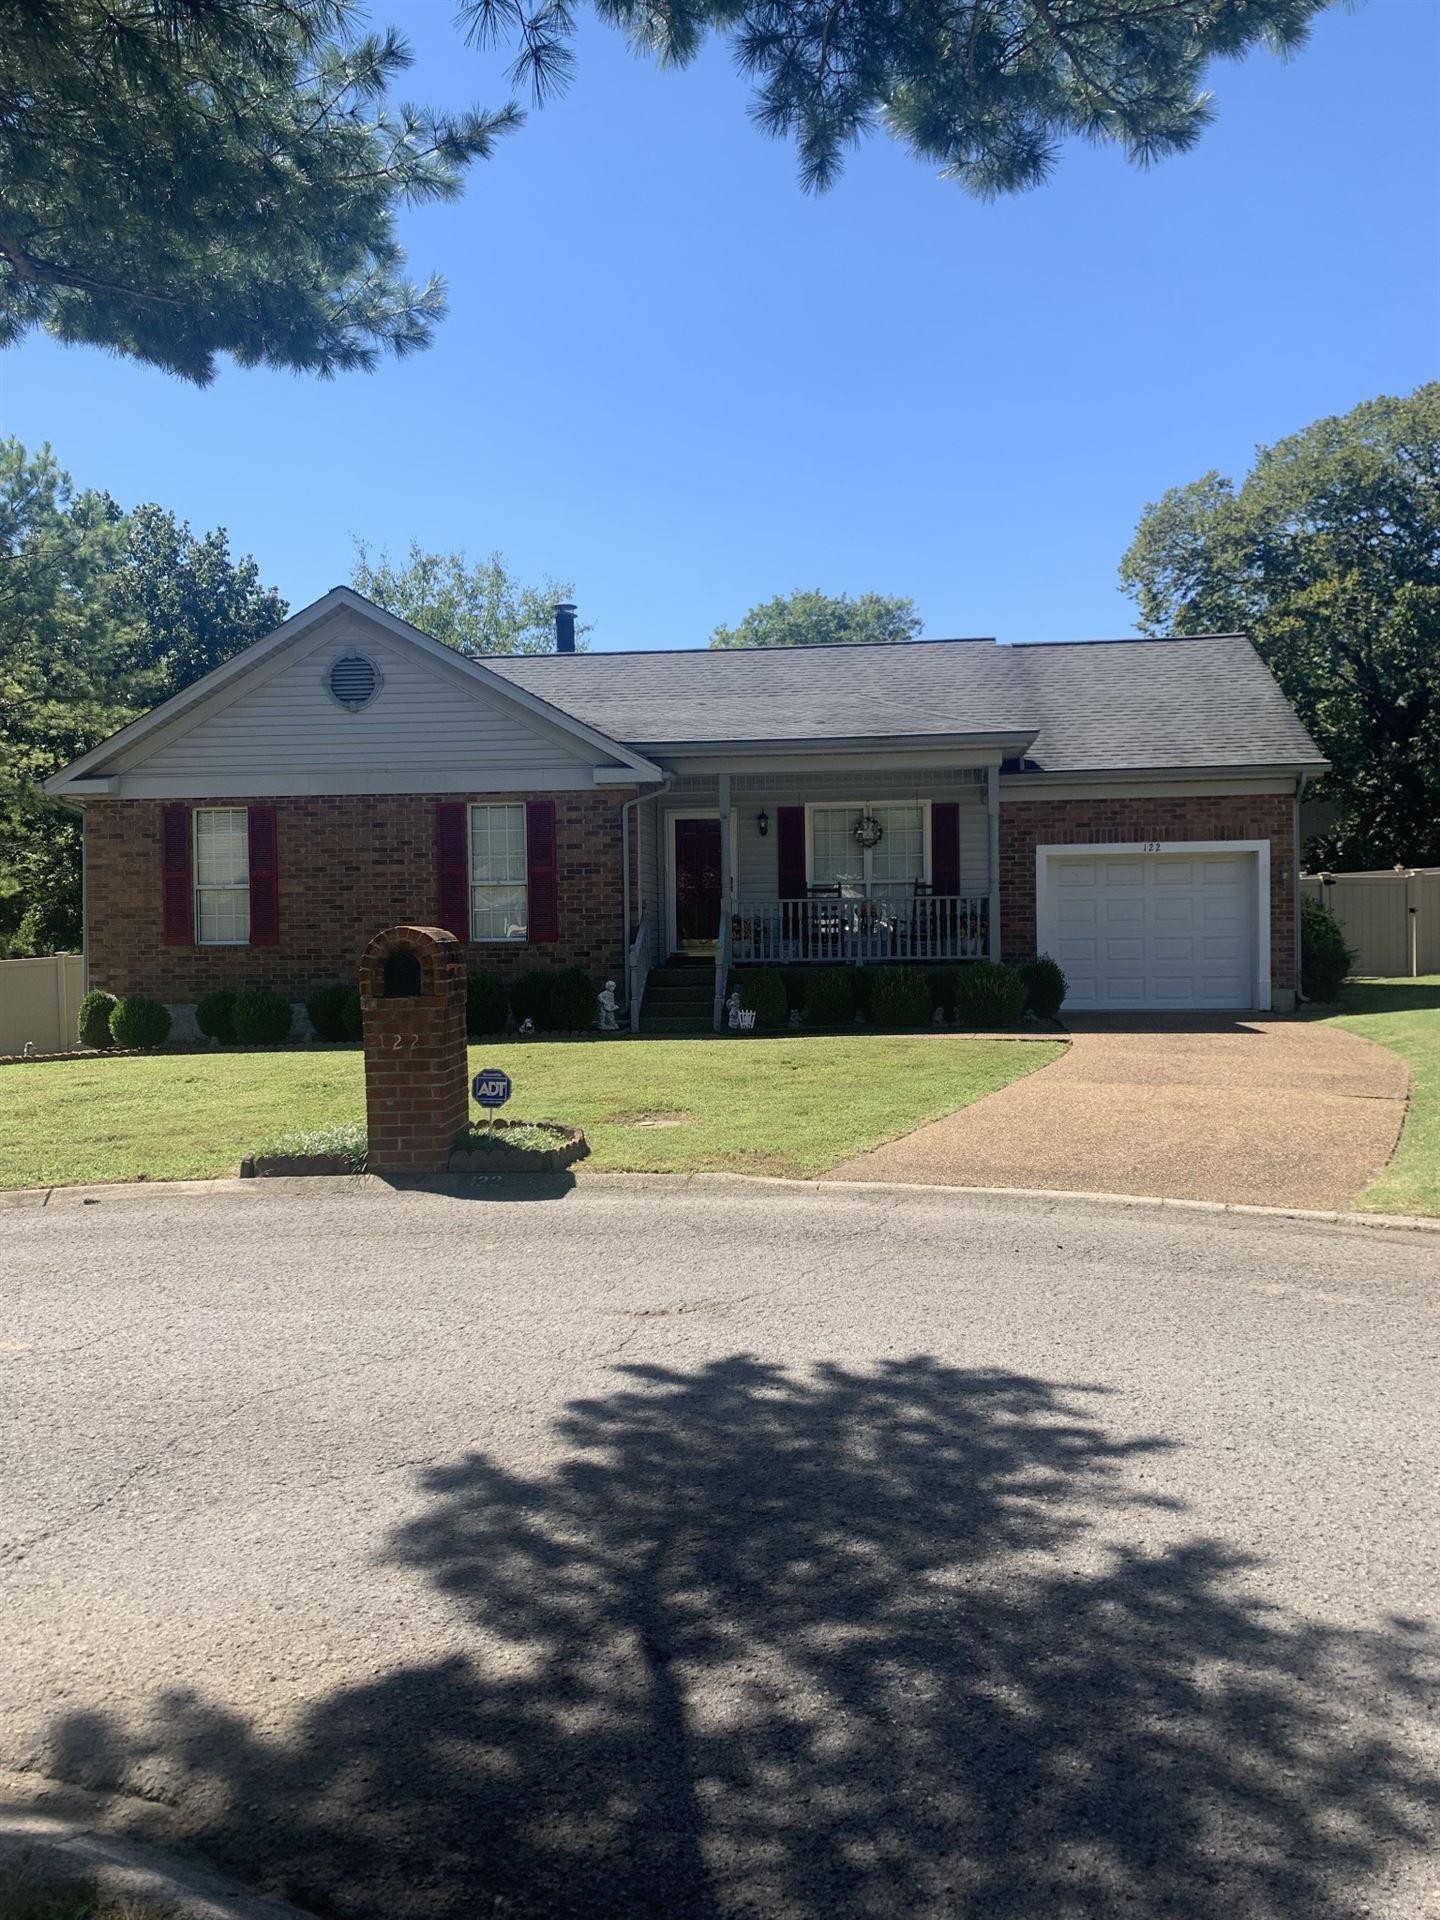 122 Buckingham Ct, Goodlettsville, TN 37072 - MLS#: 2295447